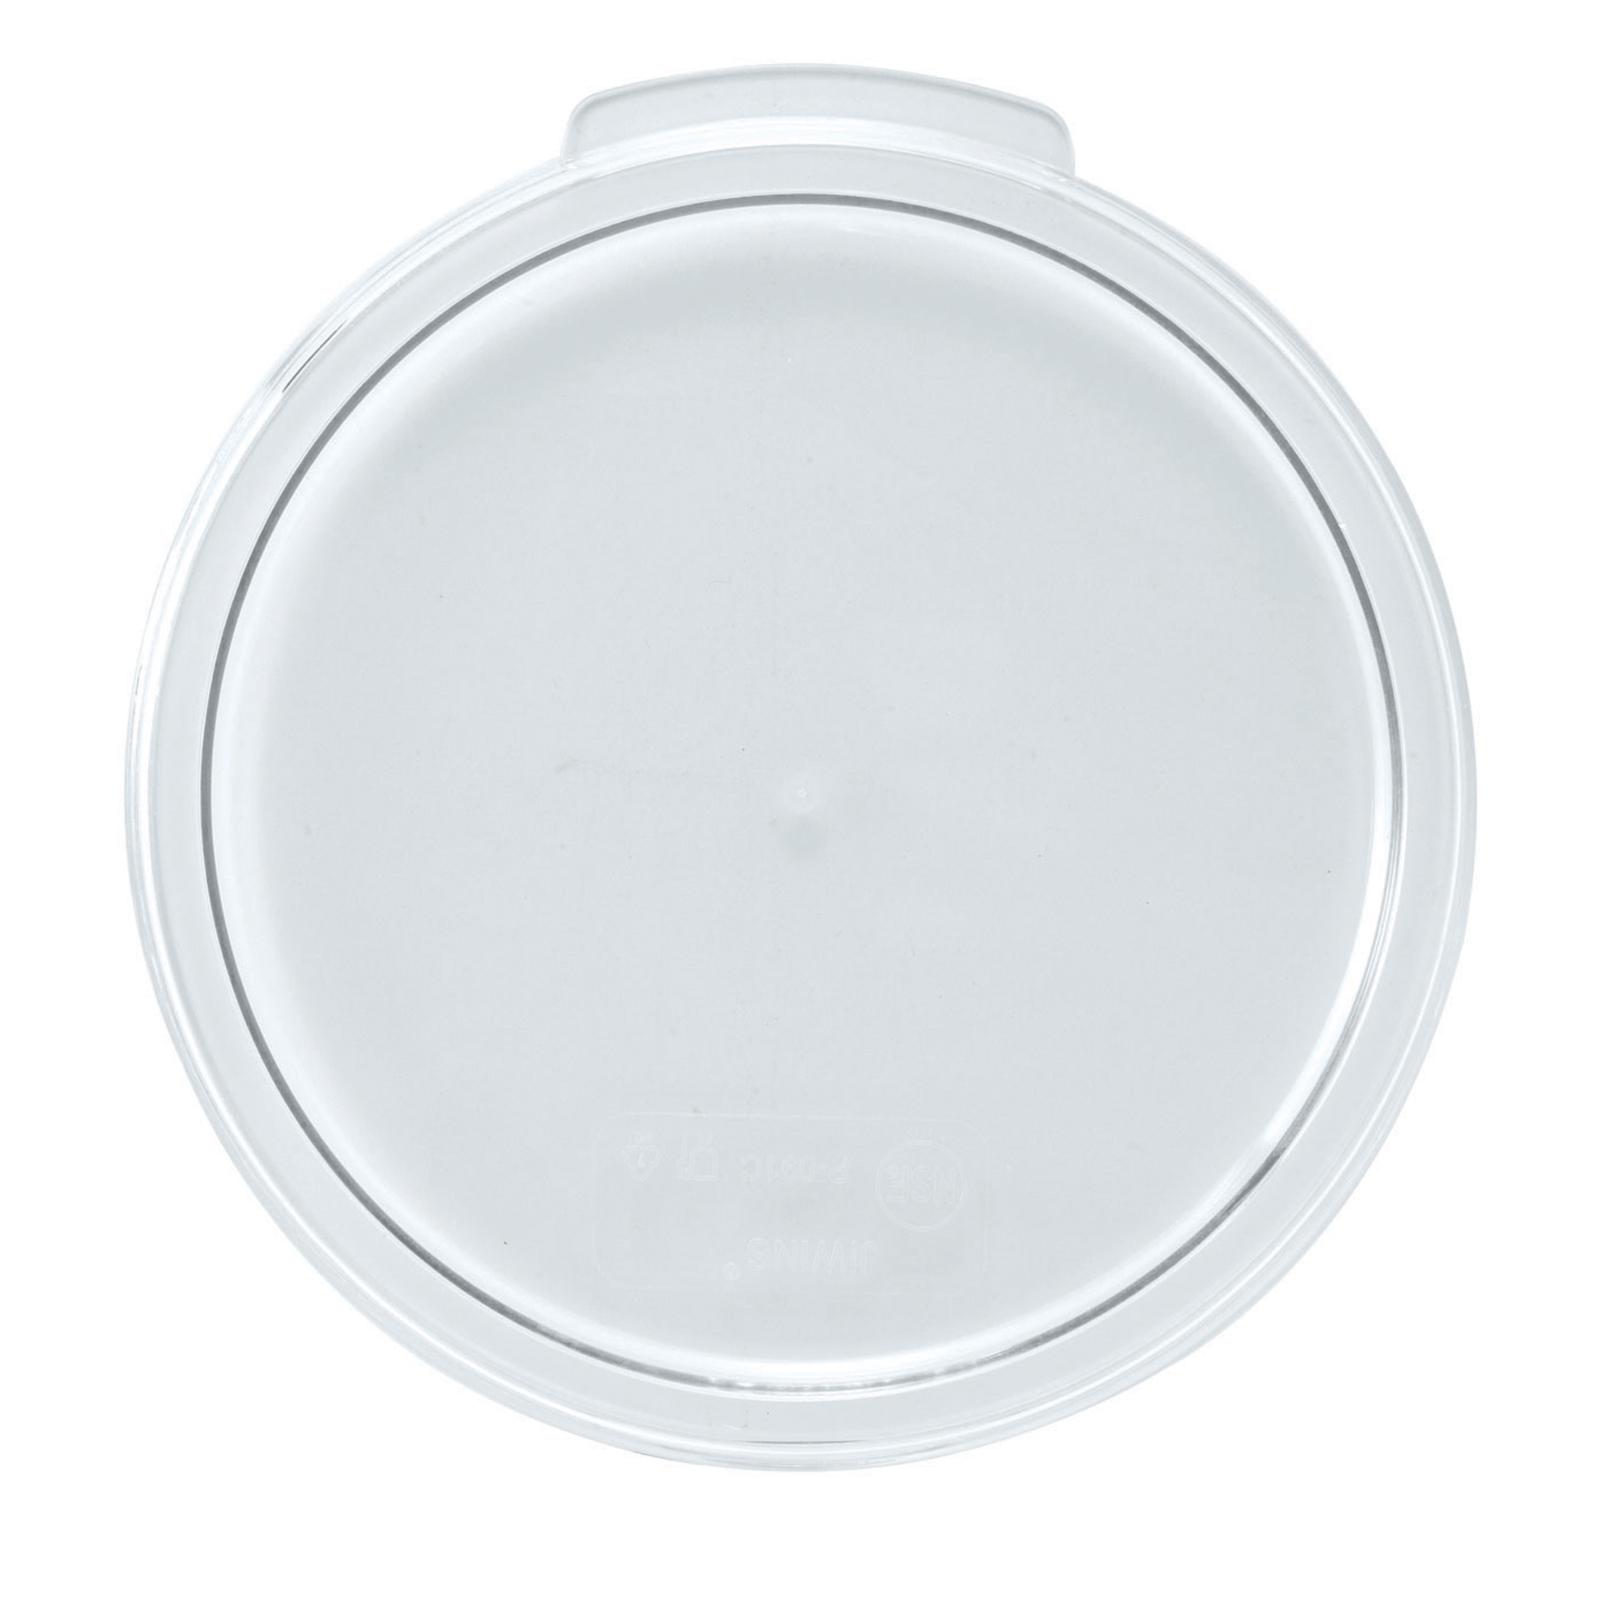 Winco PTRC-68C food storage container cover